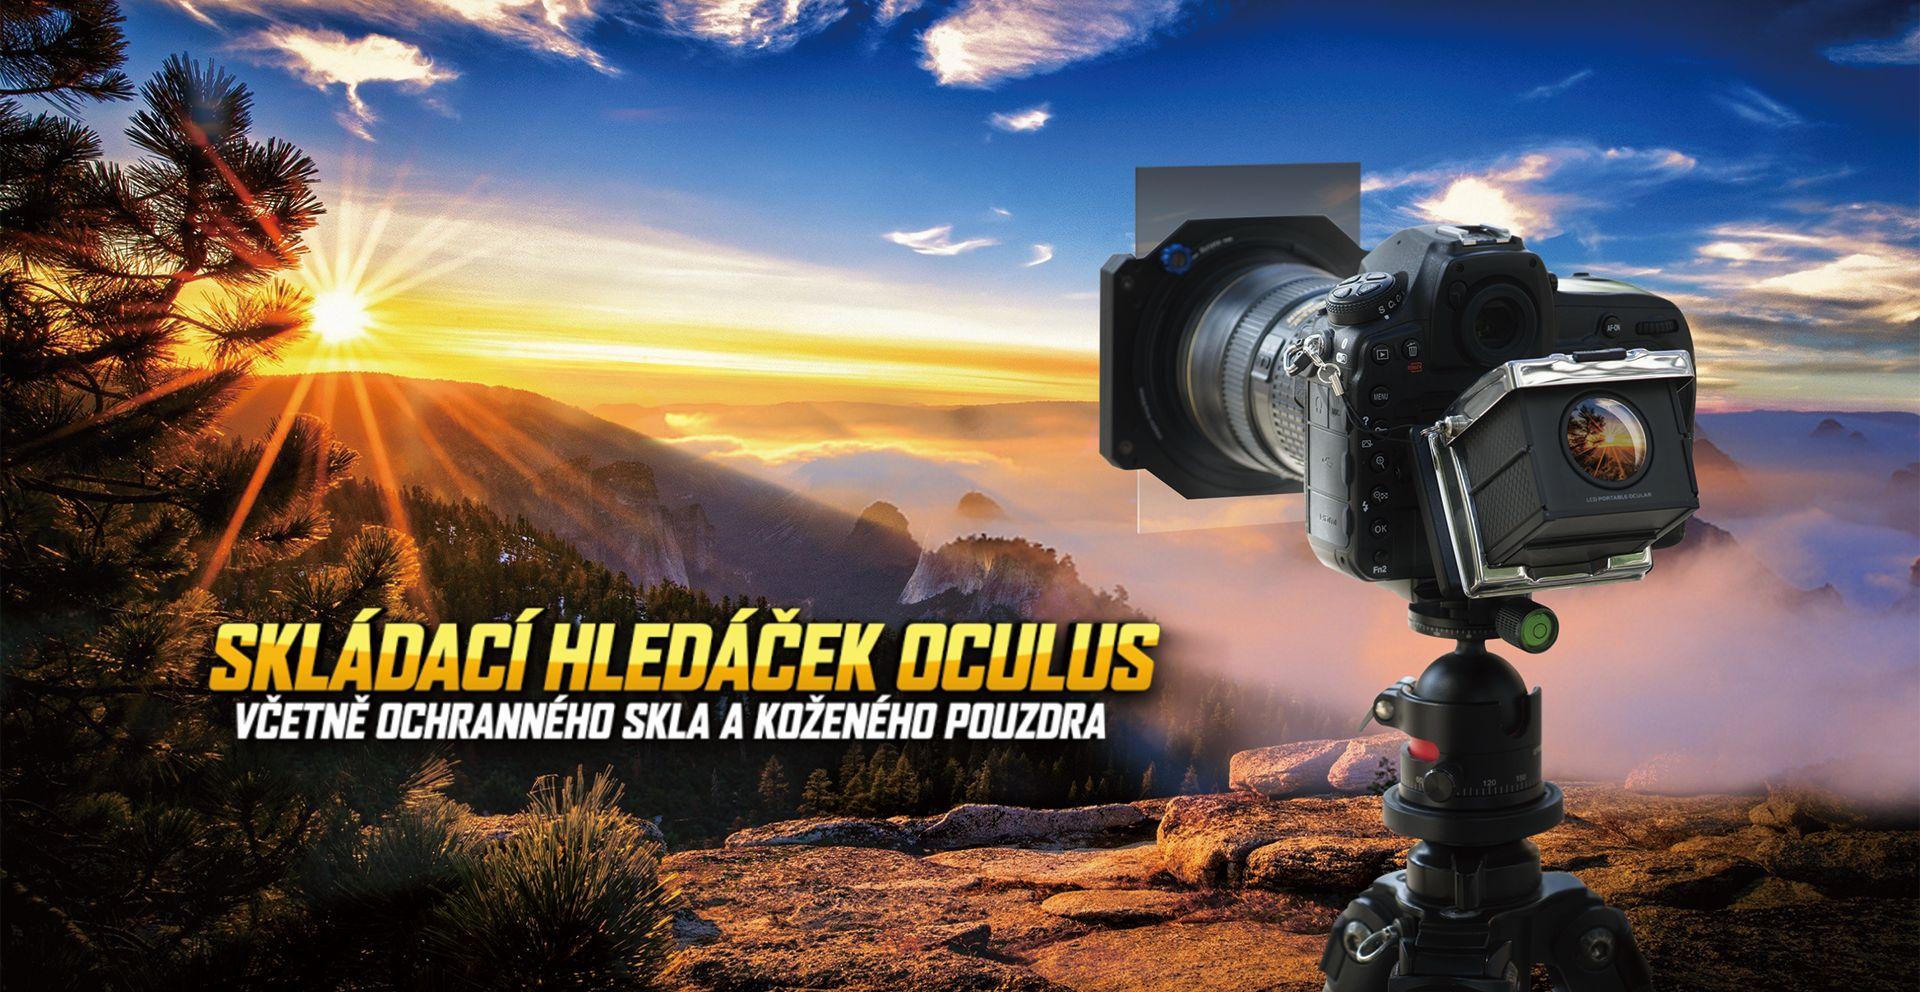 film-technika-ggs-oculus-intext1